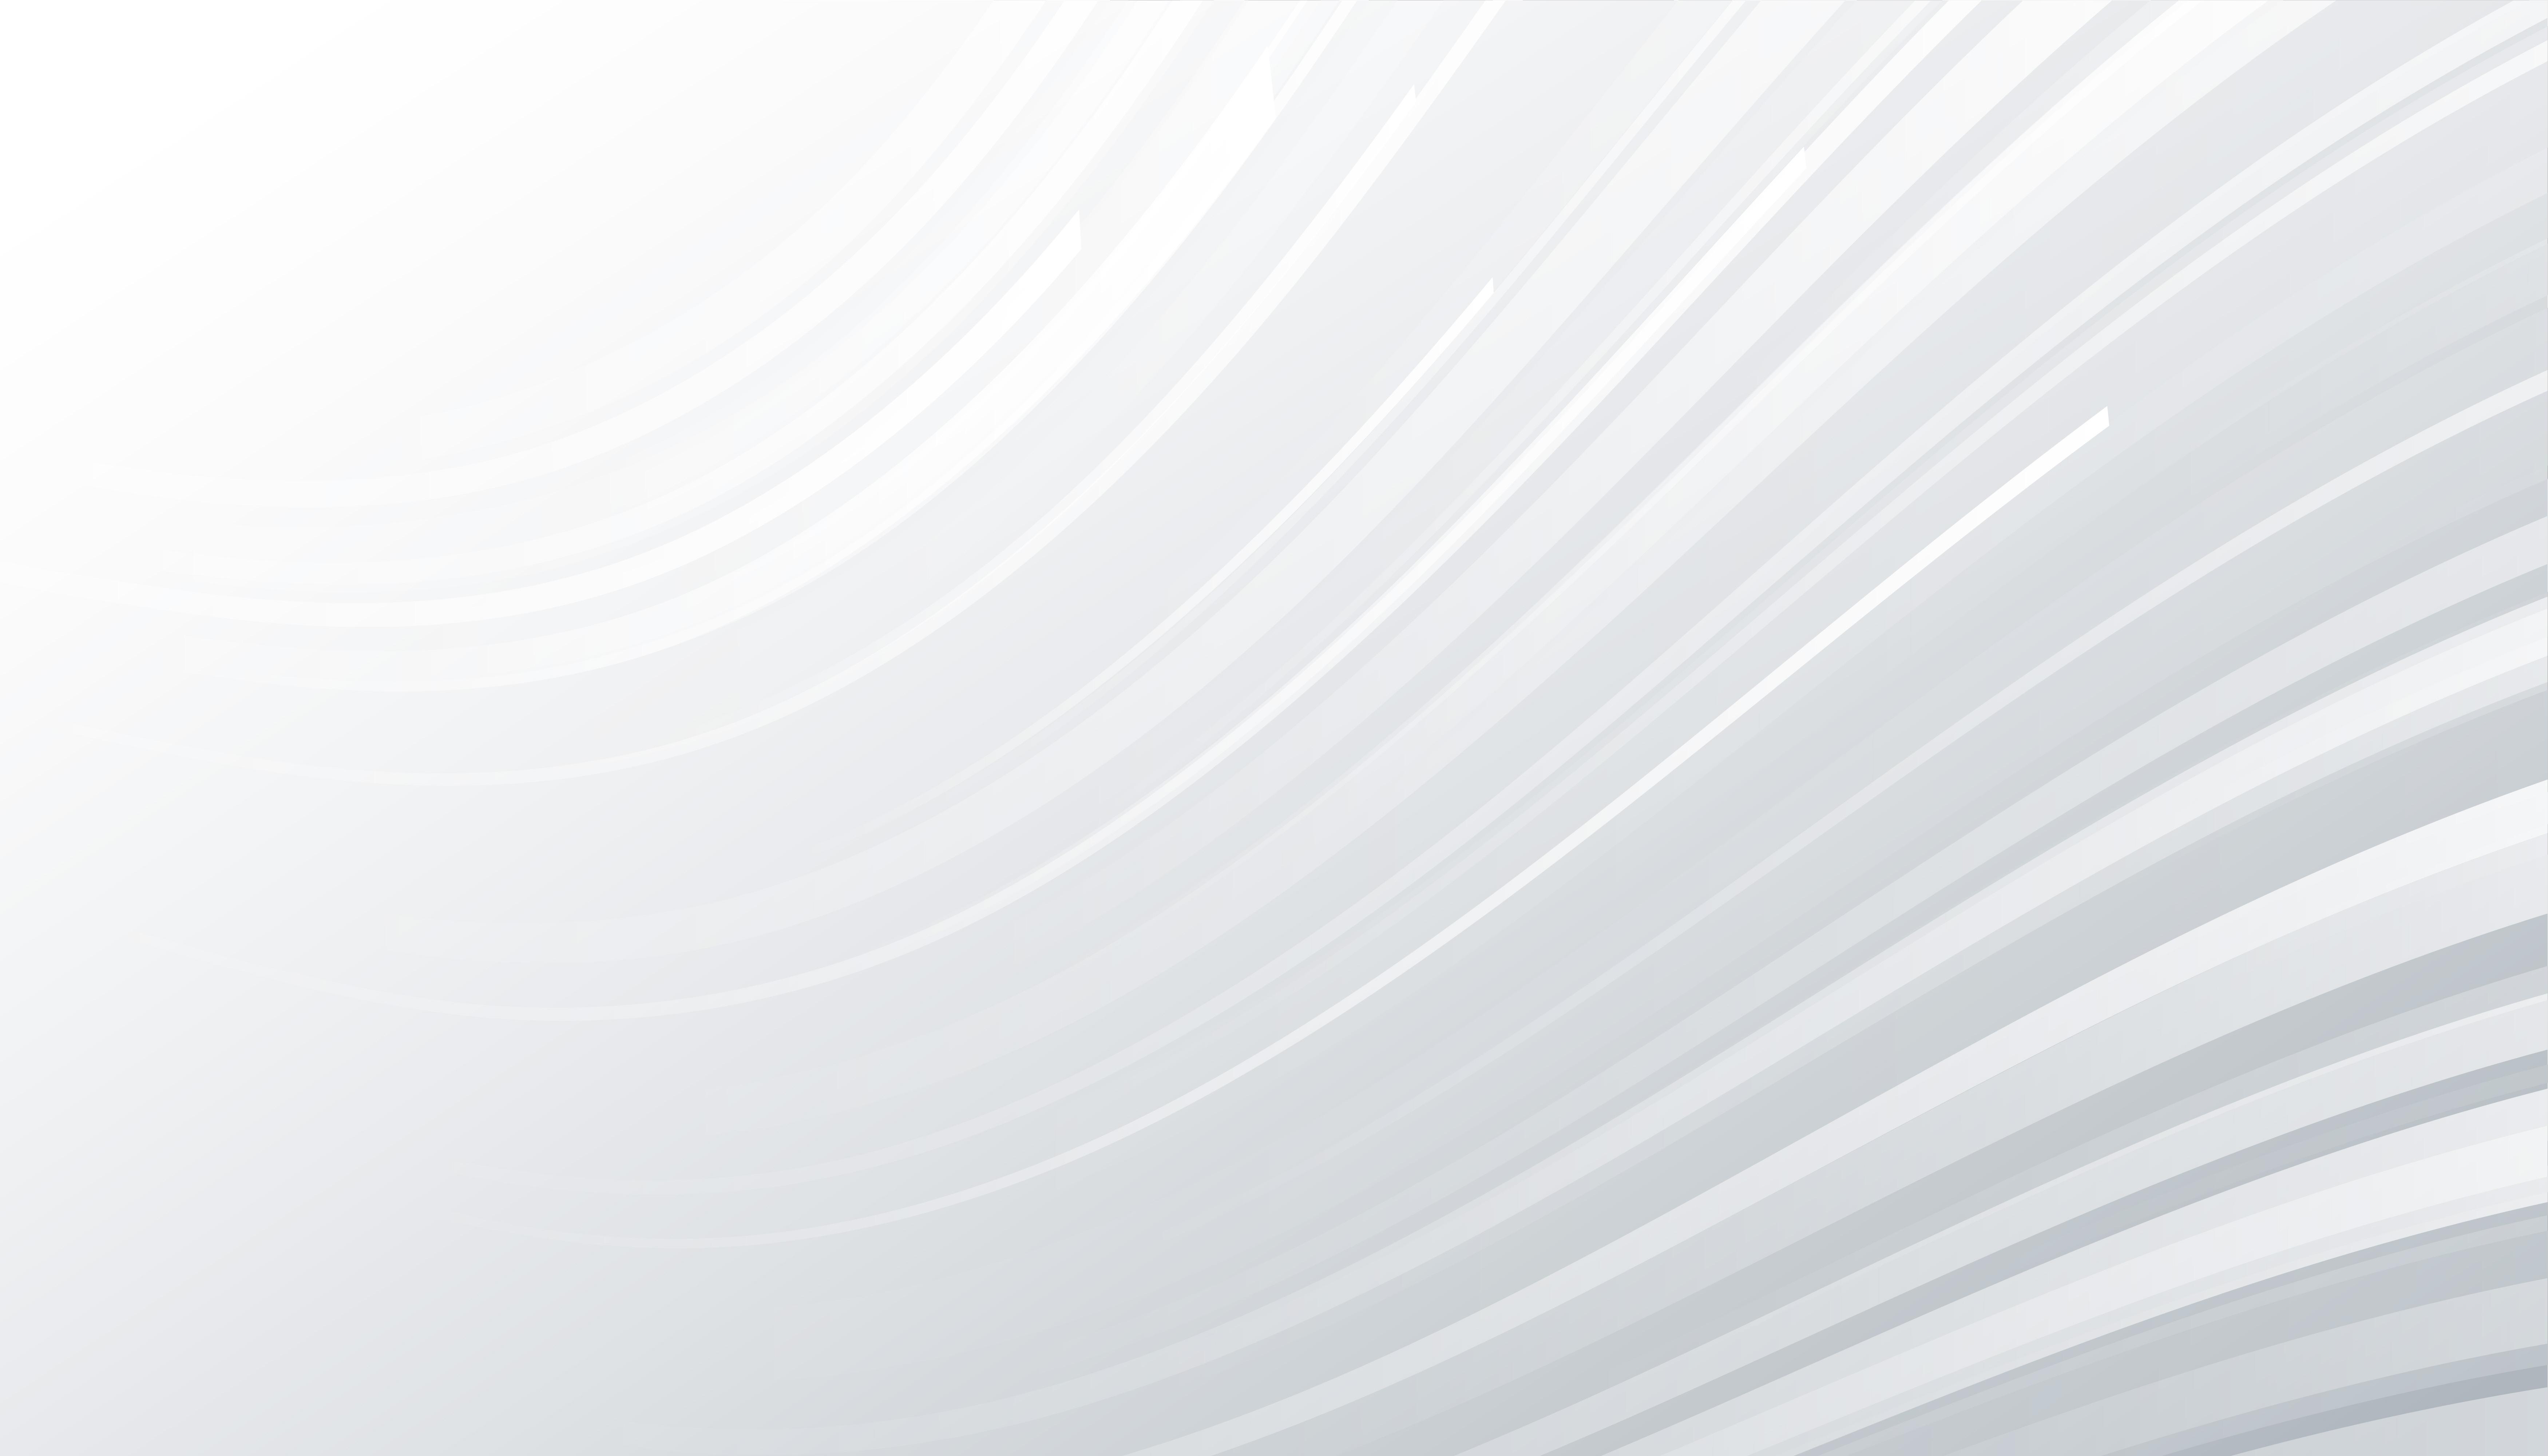 https://mckenzieelectric.com/sites/mckenzieelectric/files/revslider/image/25099.jpg